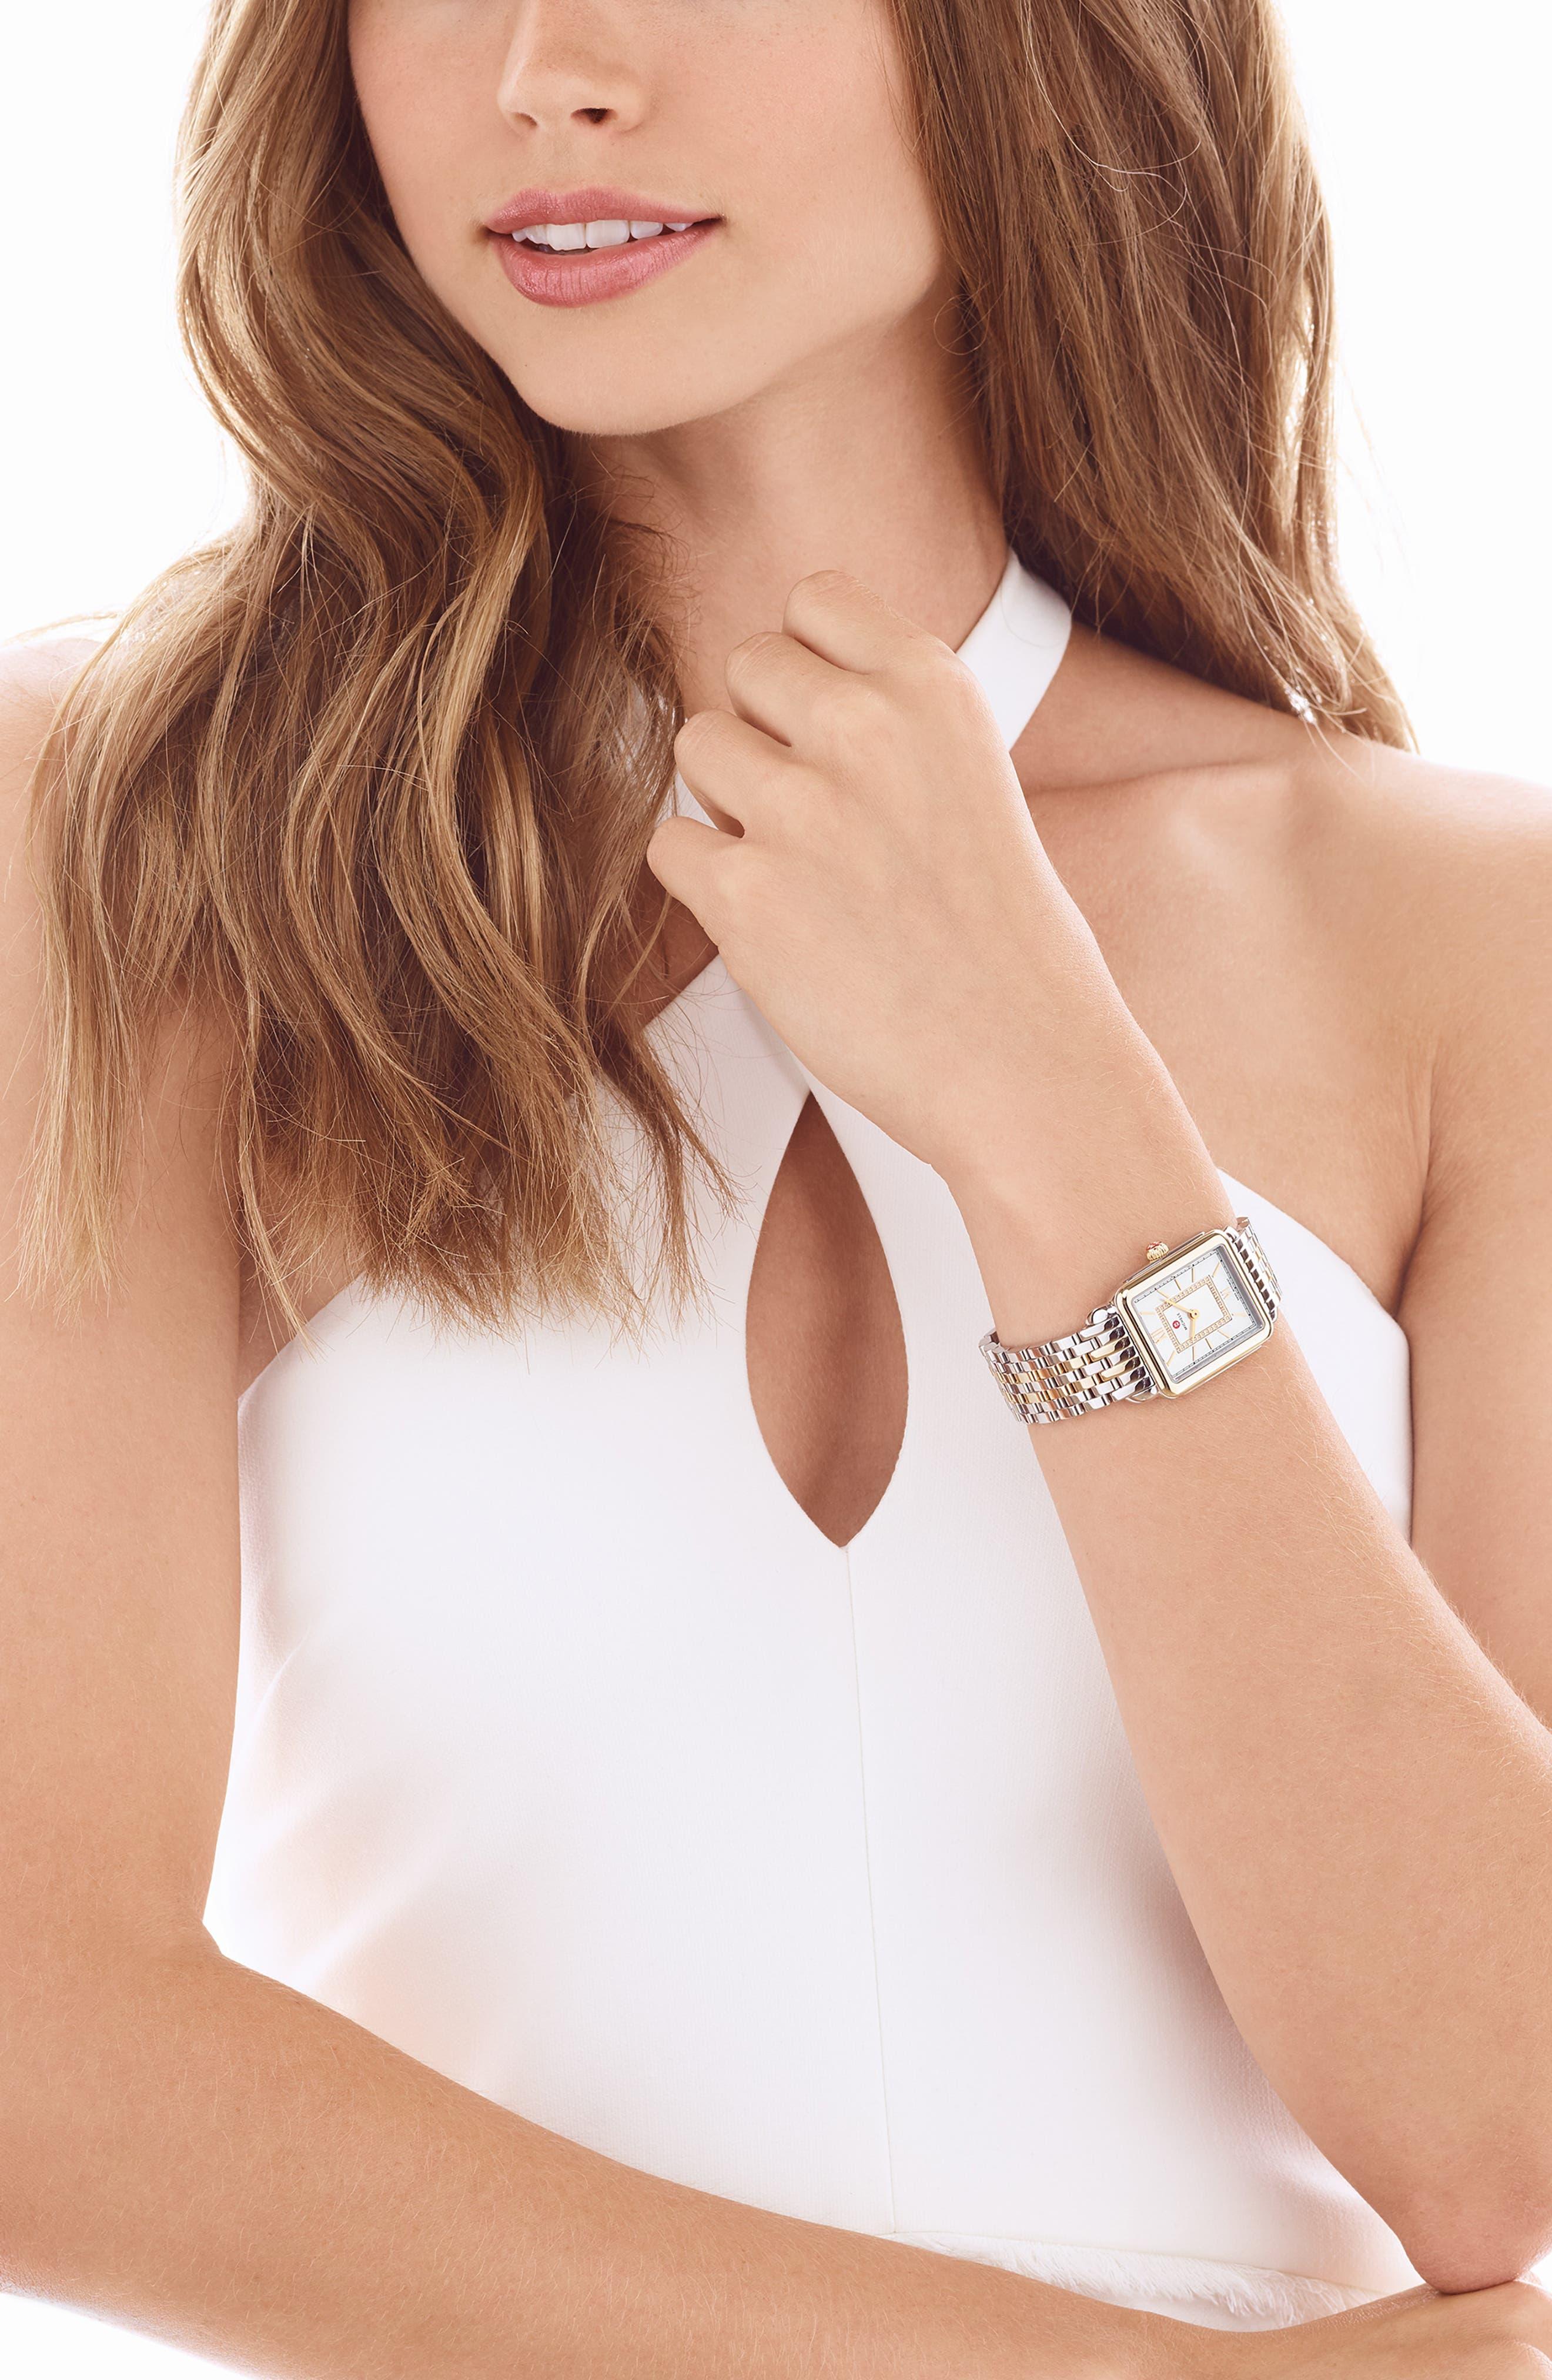 Deco II Mid 16mm Bracelet Watchband,                             Alternate thumbnail 8, color,                             SILVER/ GOLD